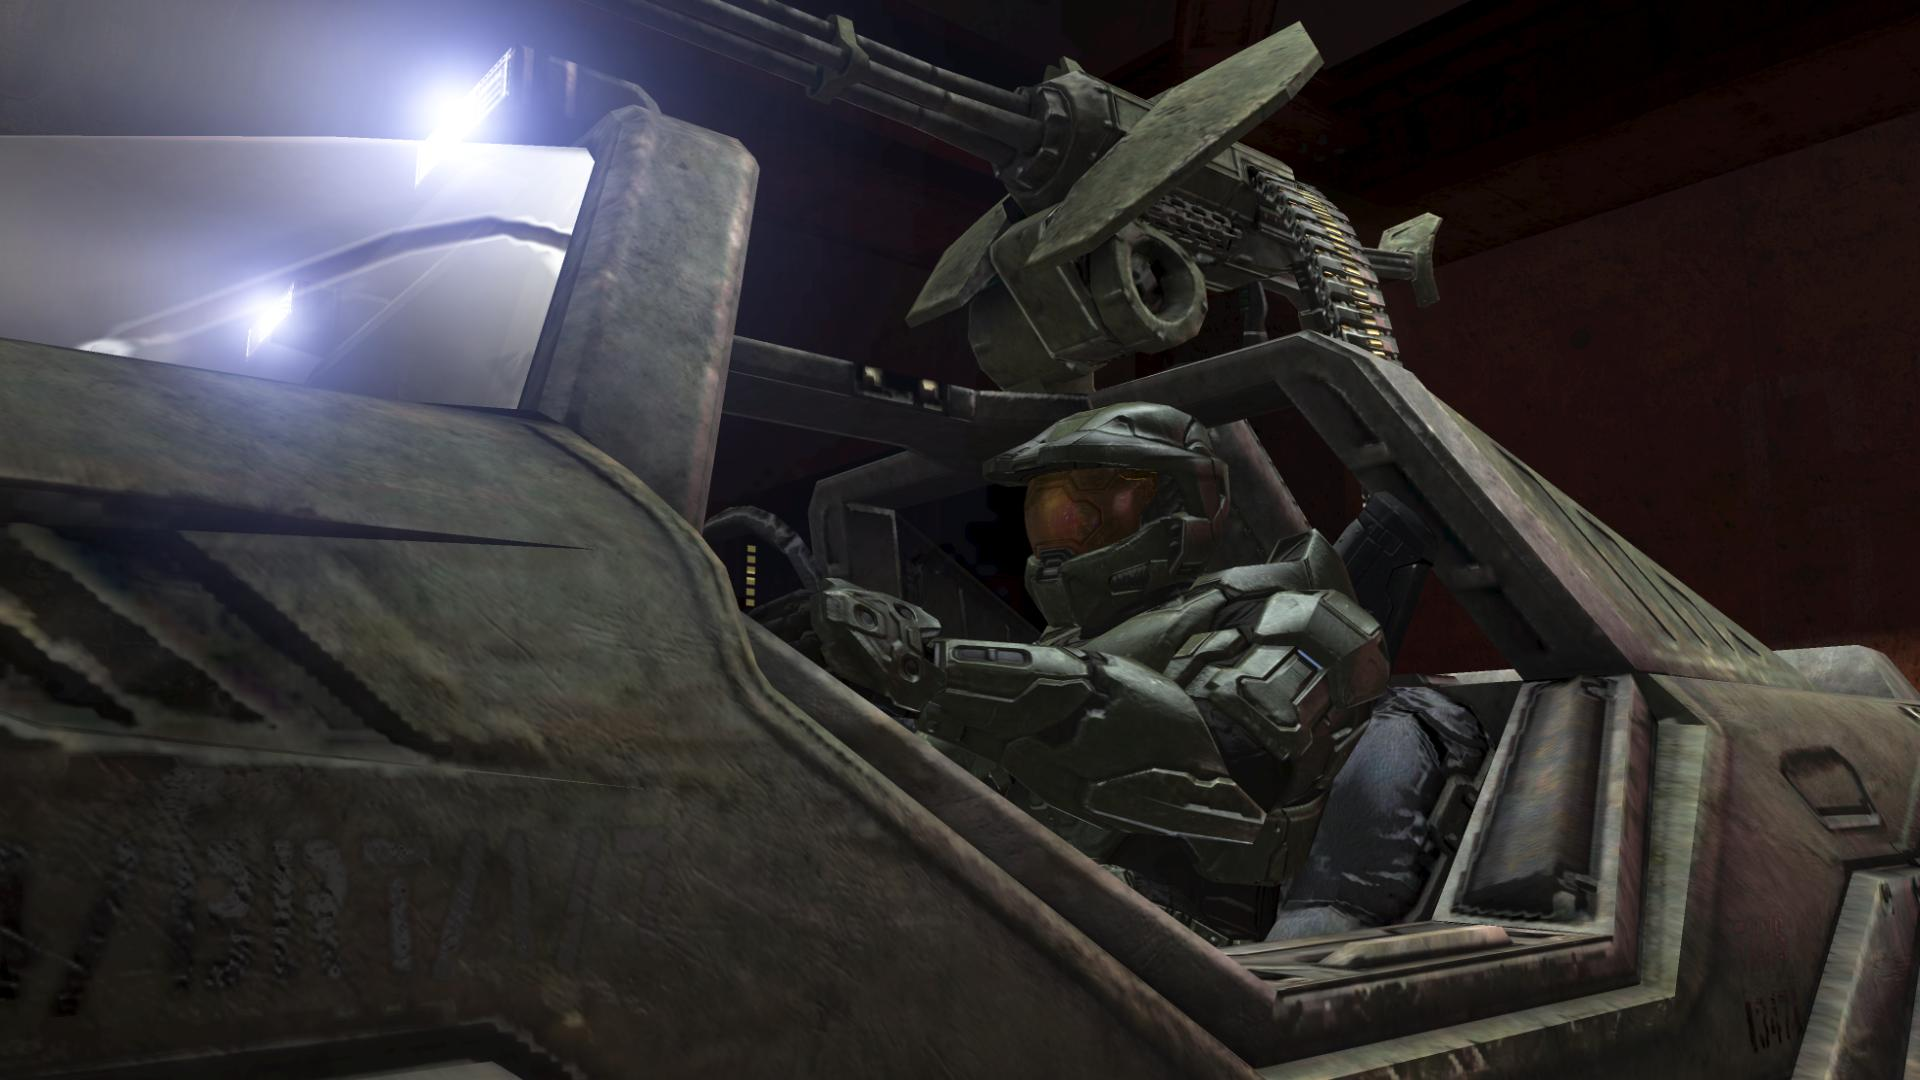 1520629889 7952354478 o Halo 3: MC vs. Warthog